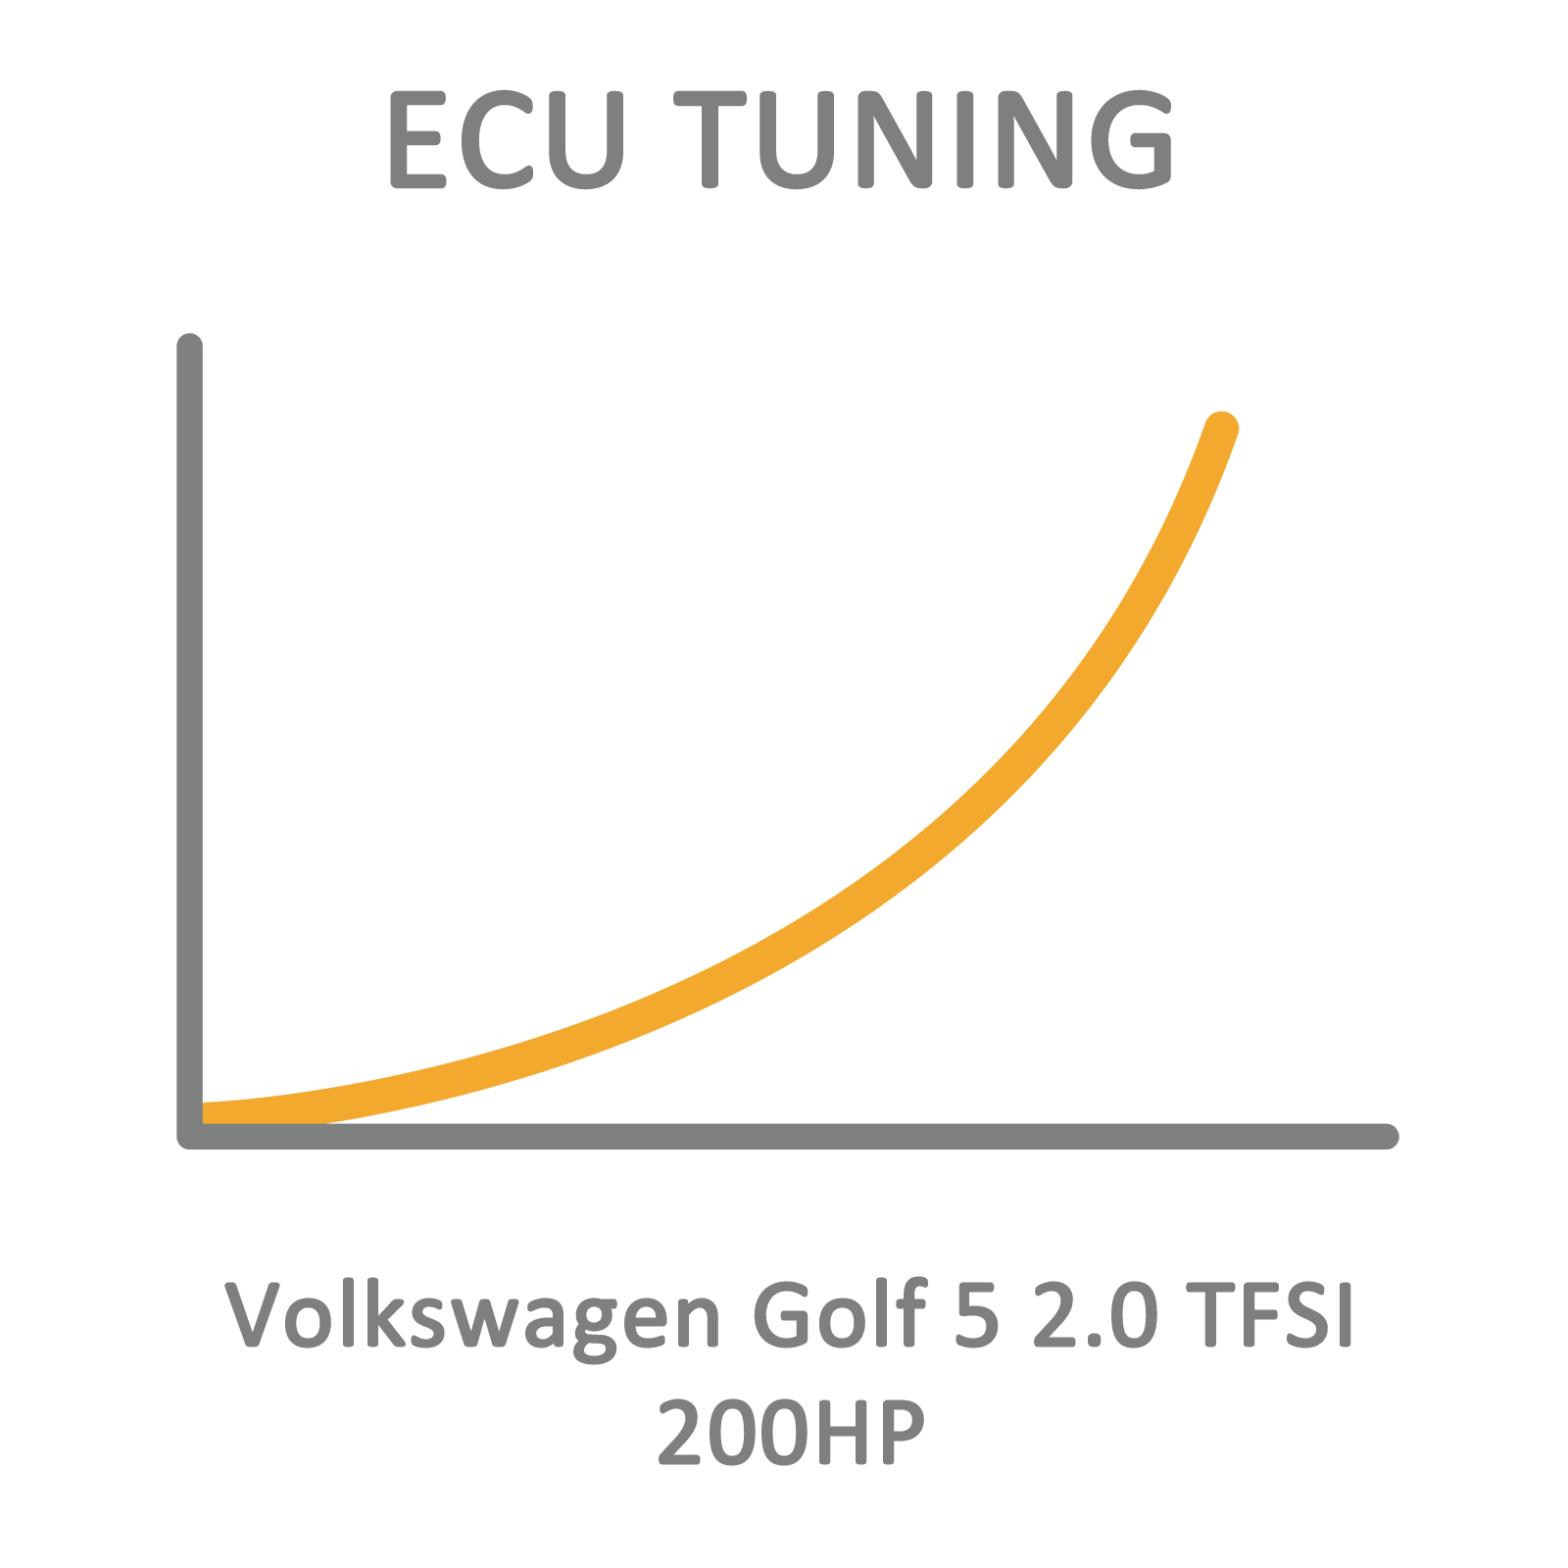 Volkswagen Golf 5 2.0 TFSI 200HP ECU Tuning Remapping